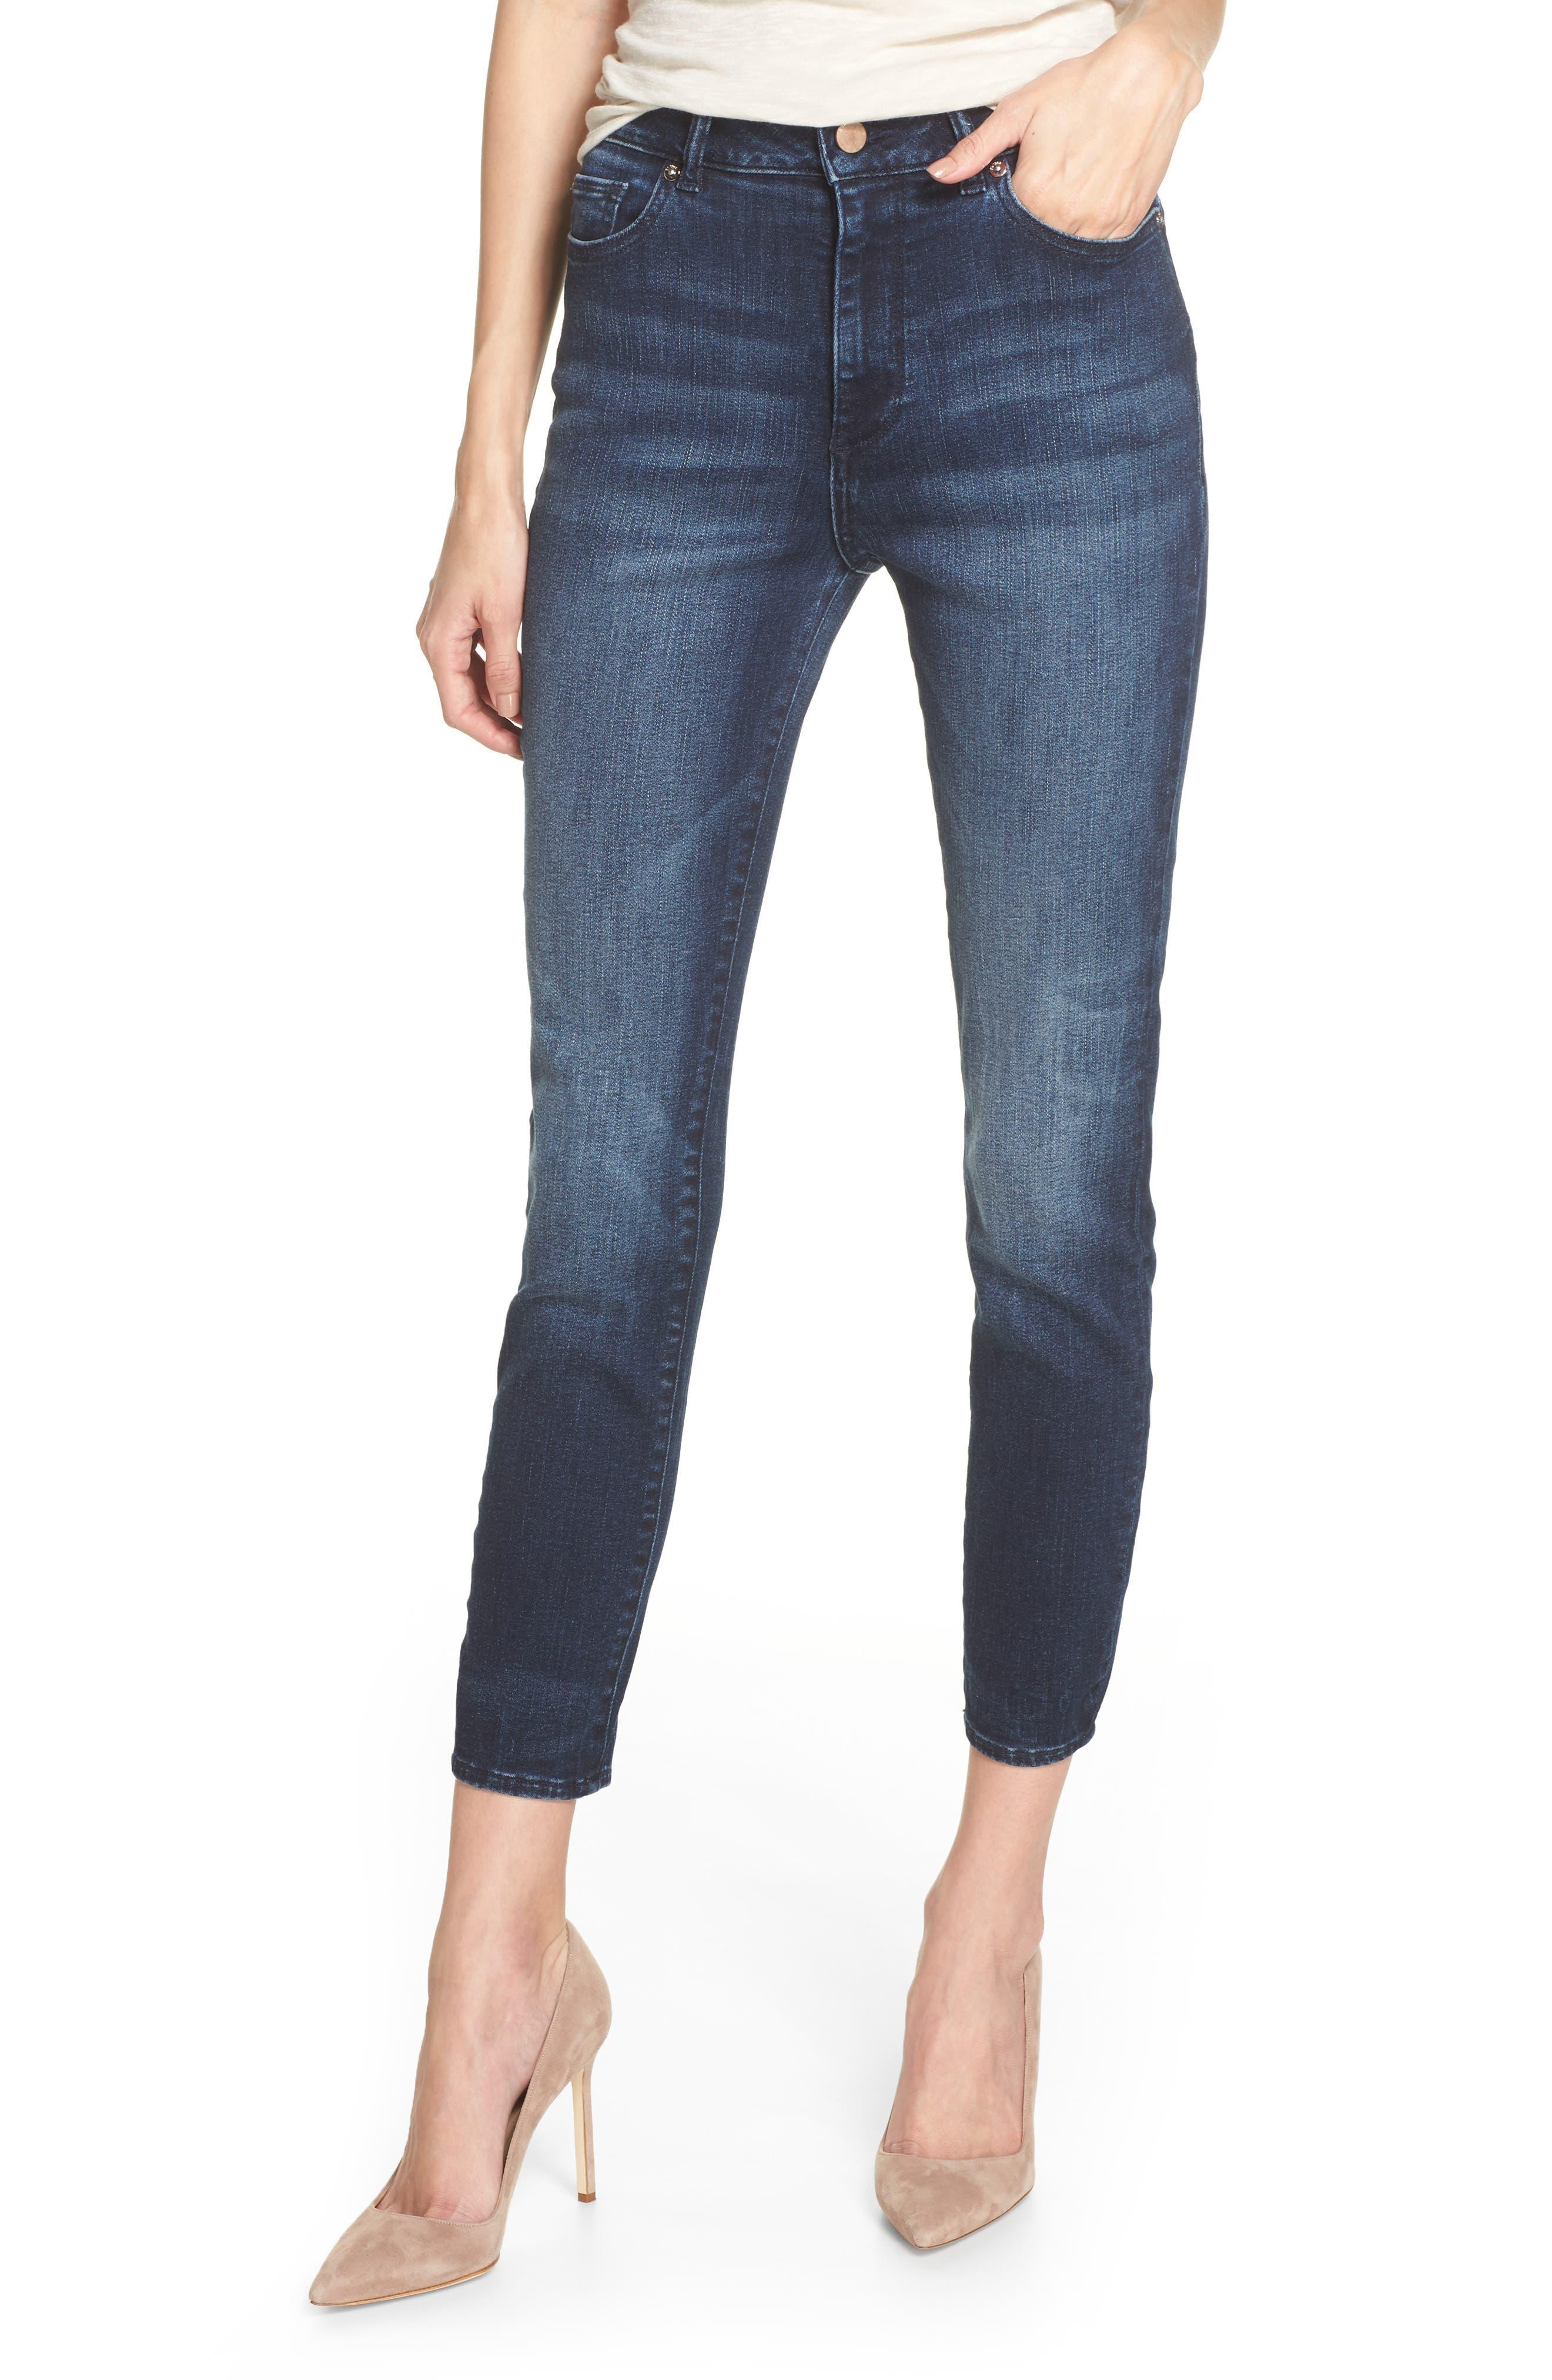 DL1961 Chrissy High Waist Ankle Skinny Jeans (Daytona)